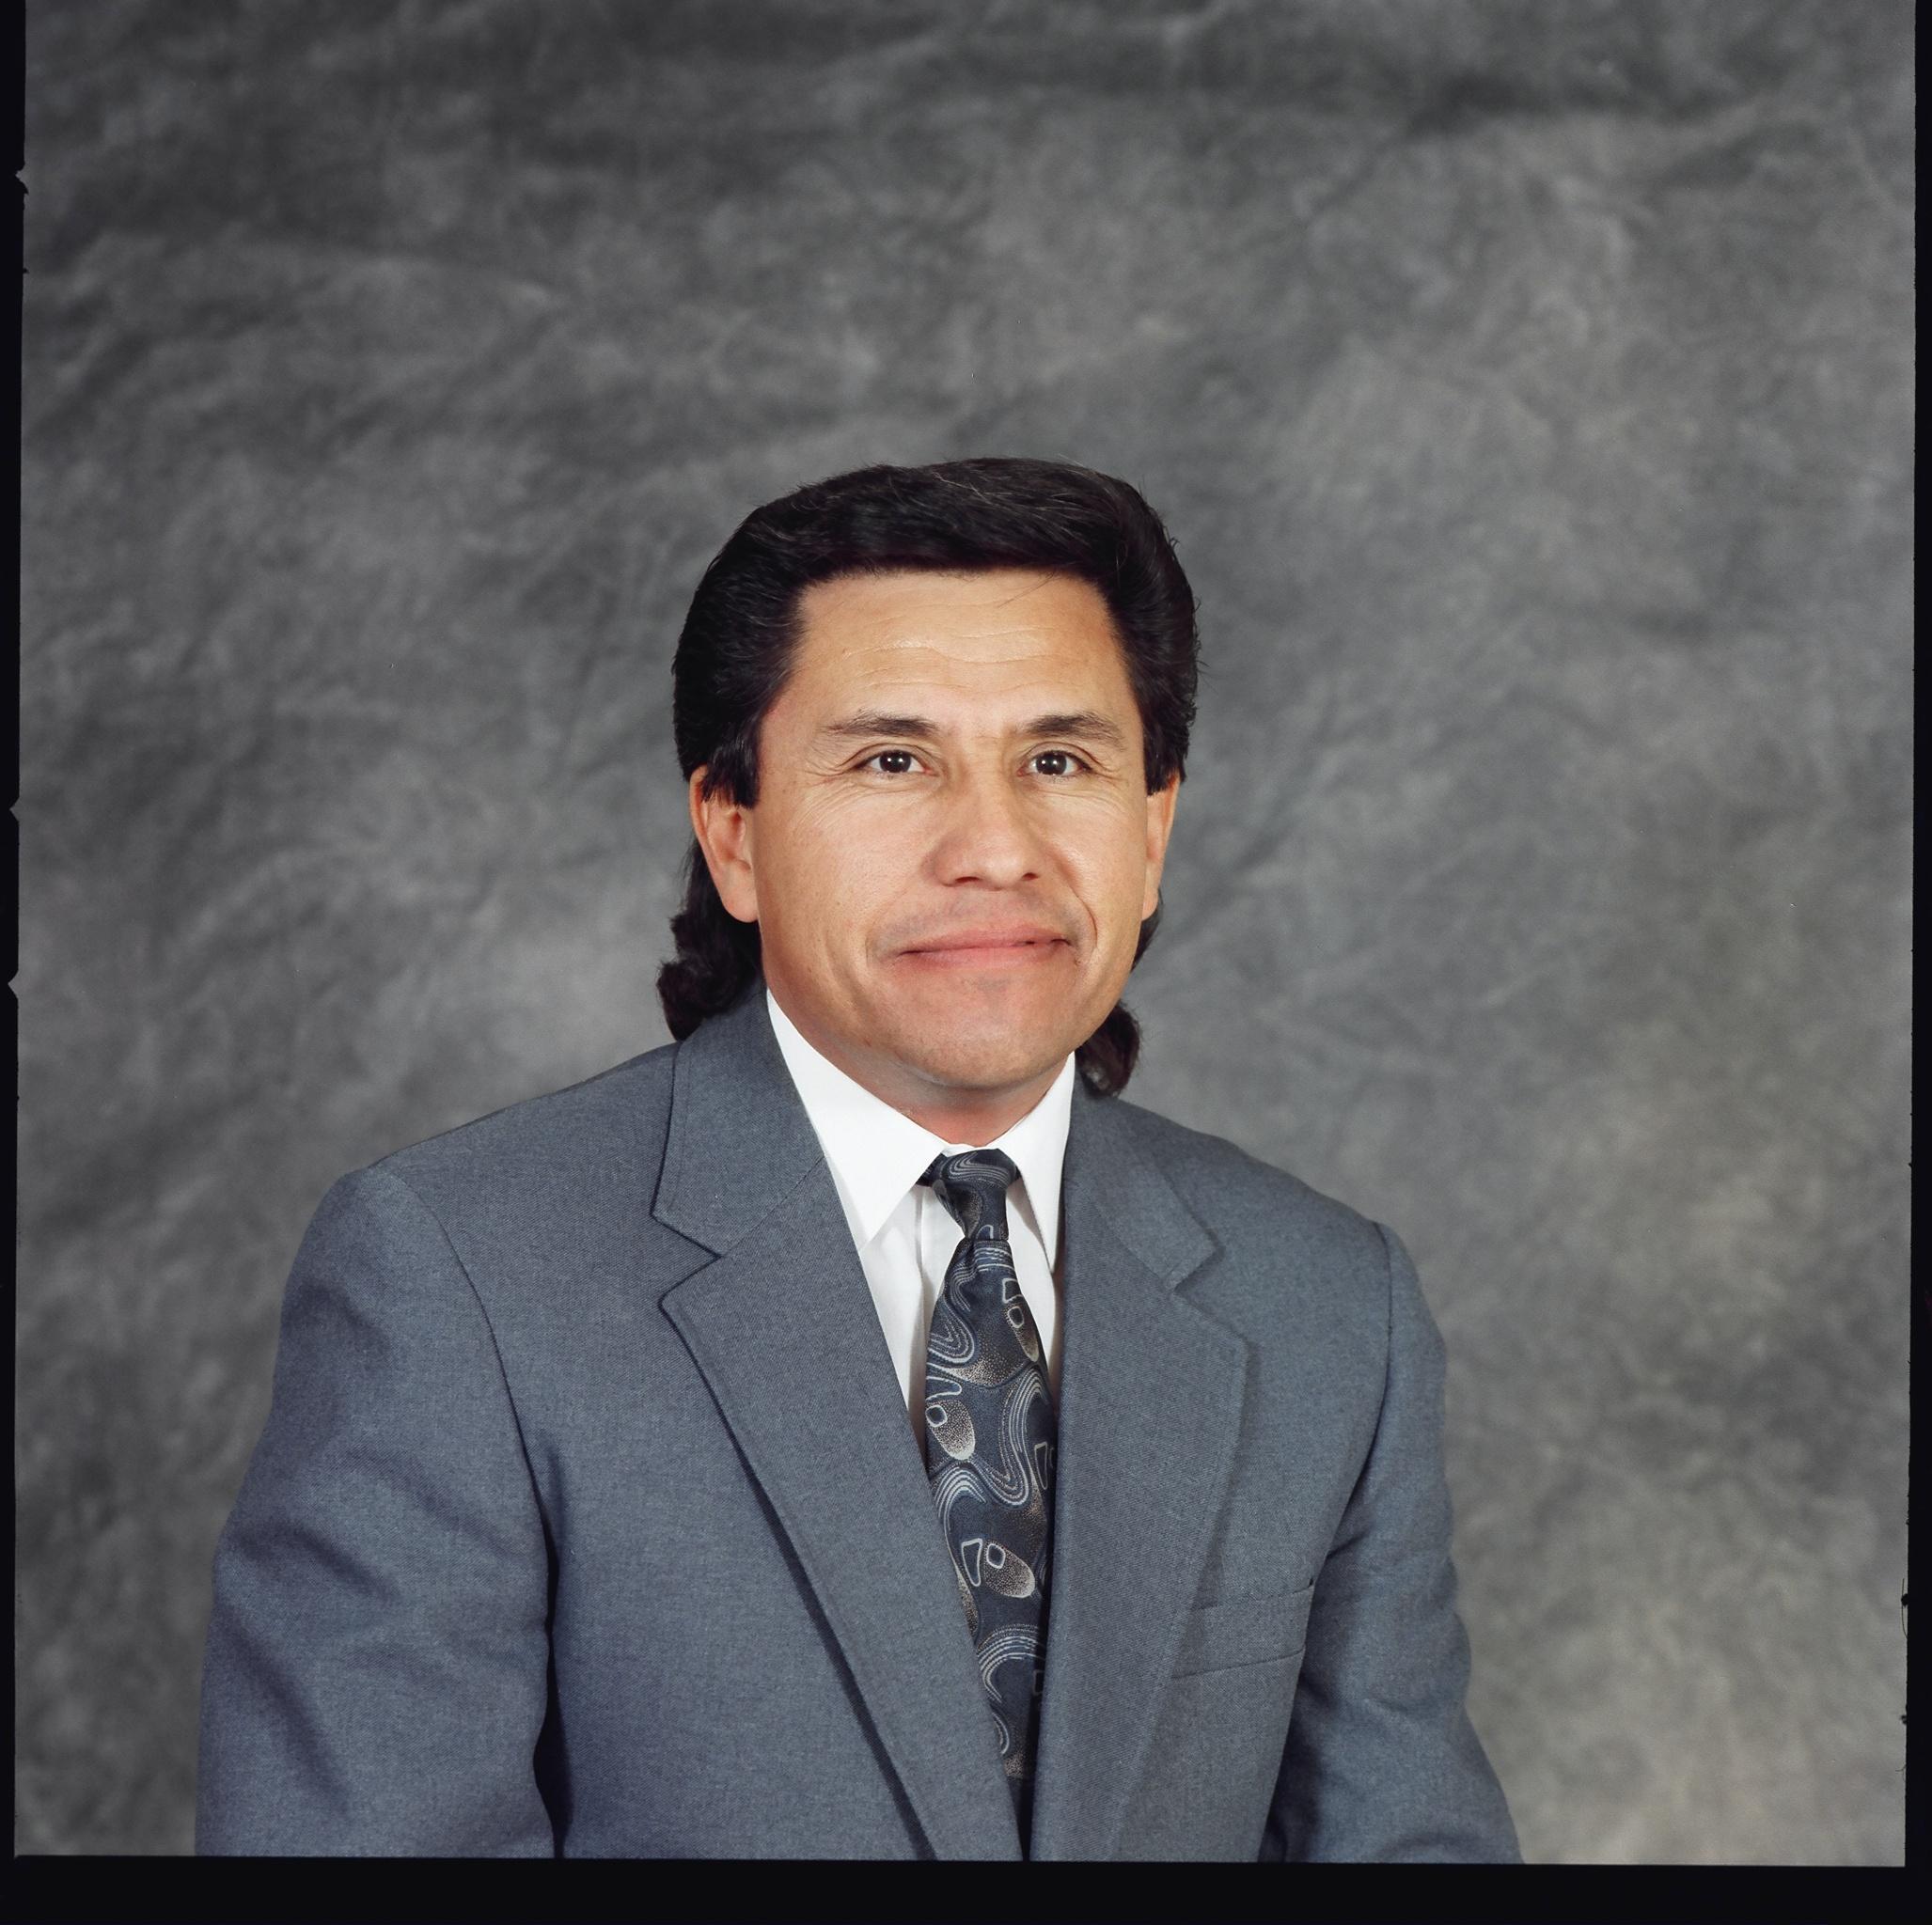 Sgt. Manuel H. Tapia